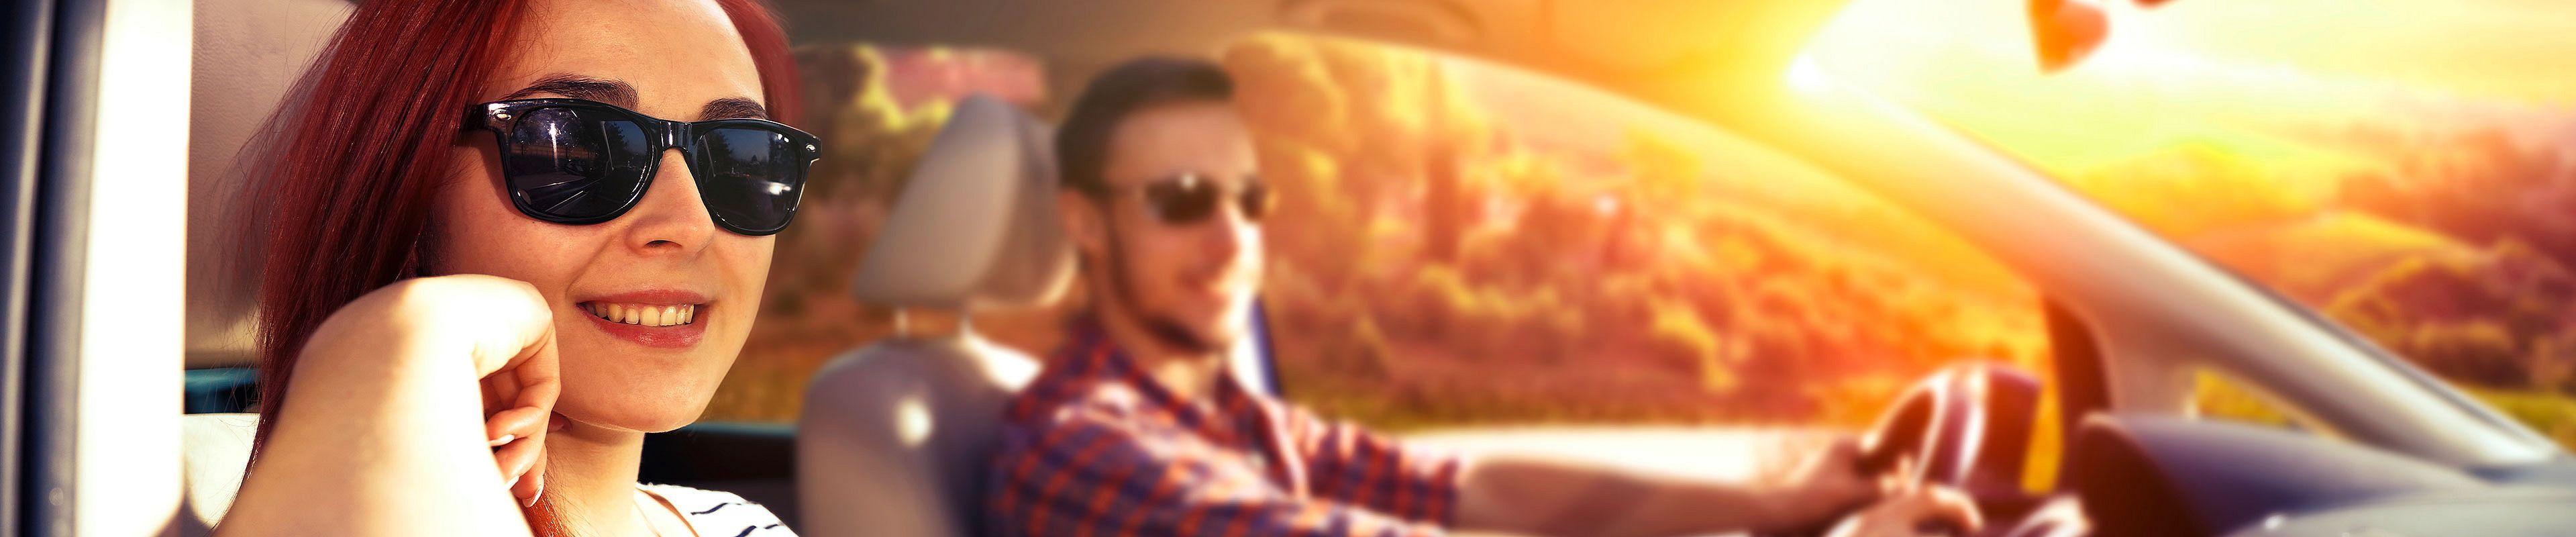 STARKE_Fahrzeug_Fahrzeugsuche_Header